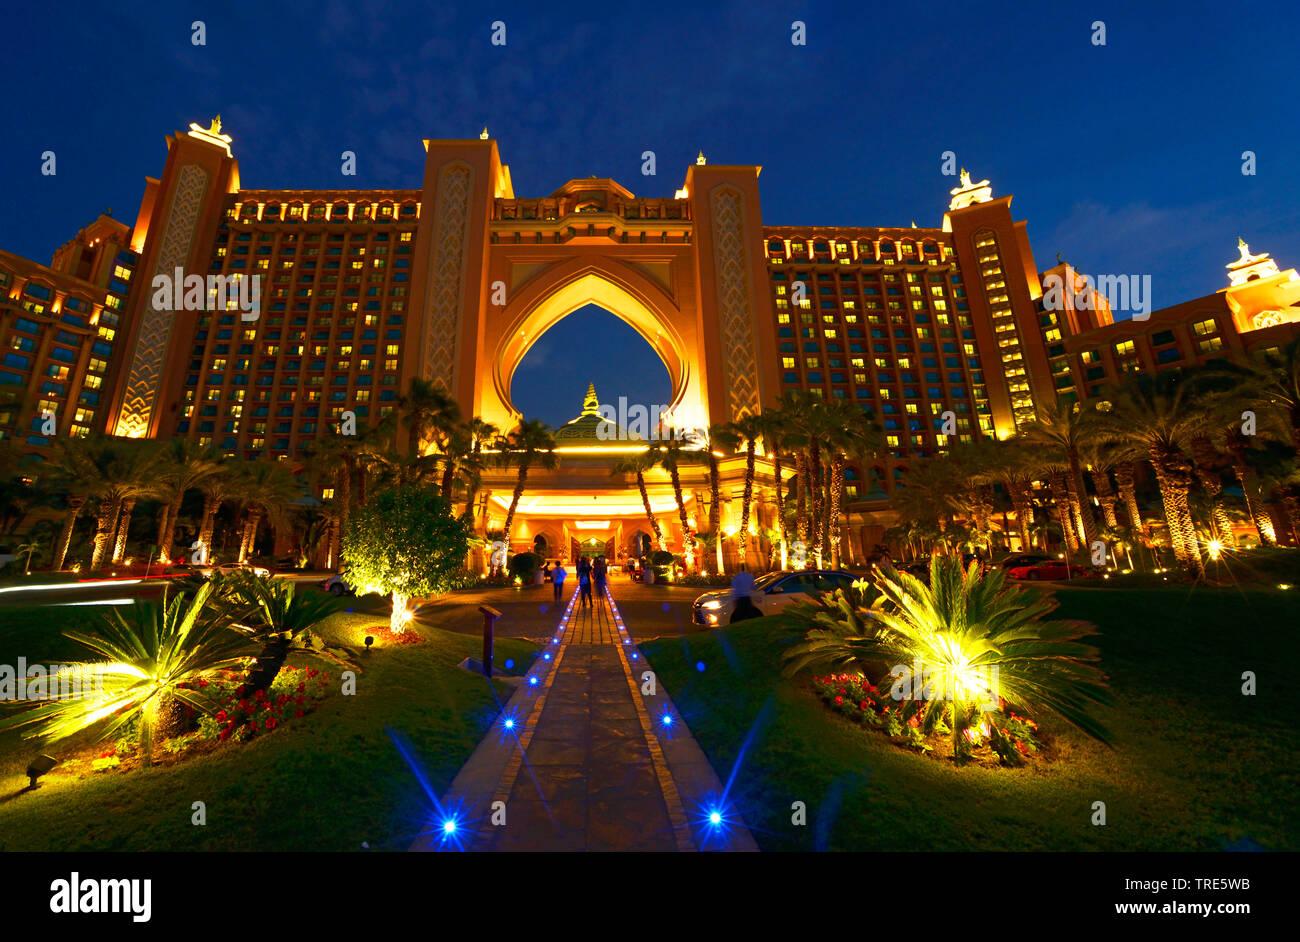 Hotel Atlantis the Palm am Abend, Vereinigte Arabische Emirate, Dubai   Atlantis the Palm Hotel in the evening, United Arab Emirates, Dubai   BLWS5180 - Stock Image